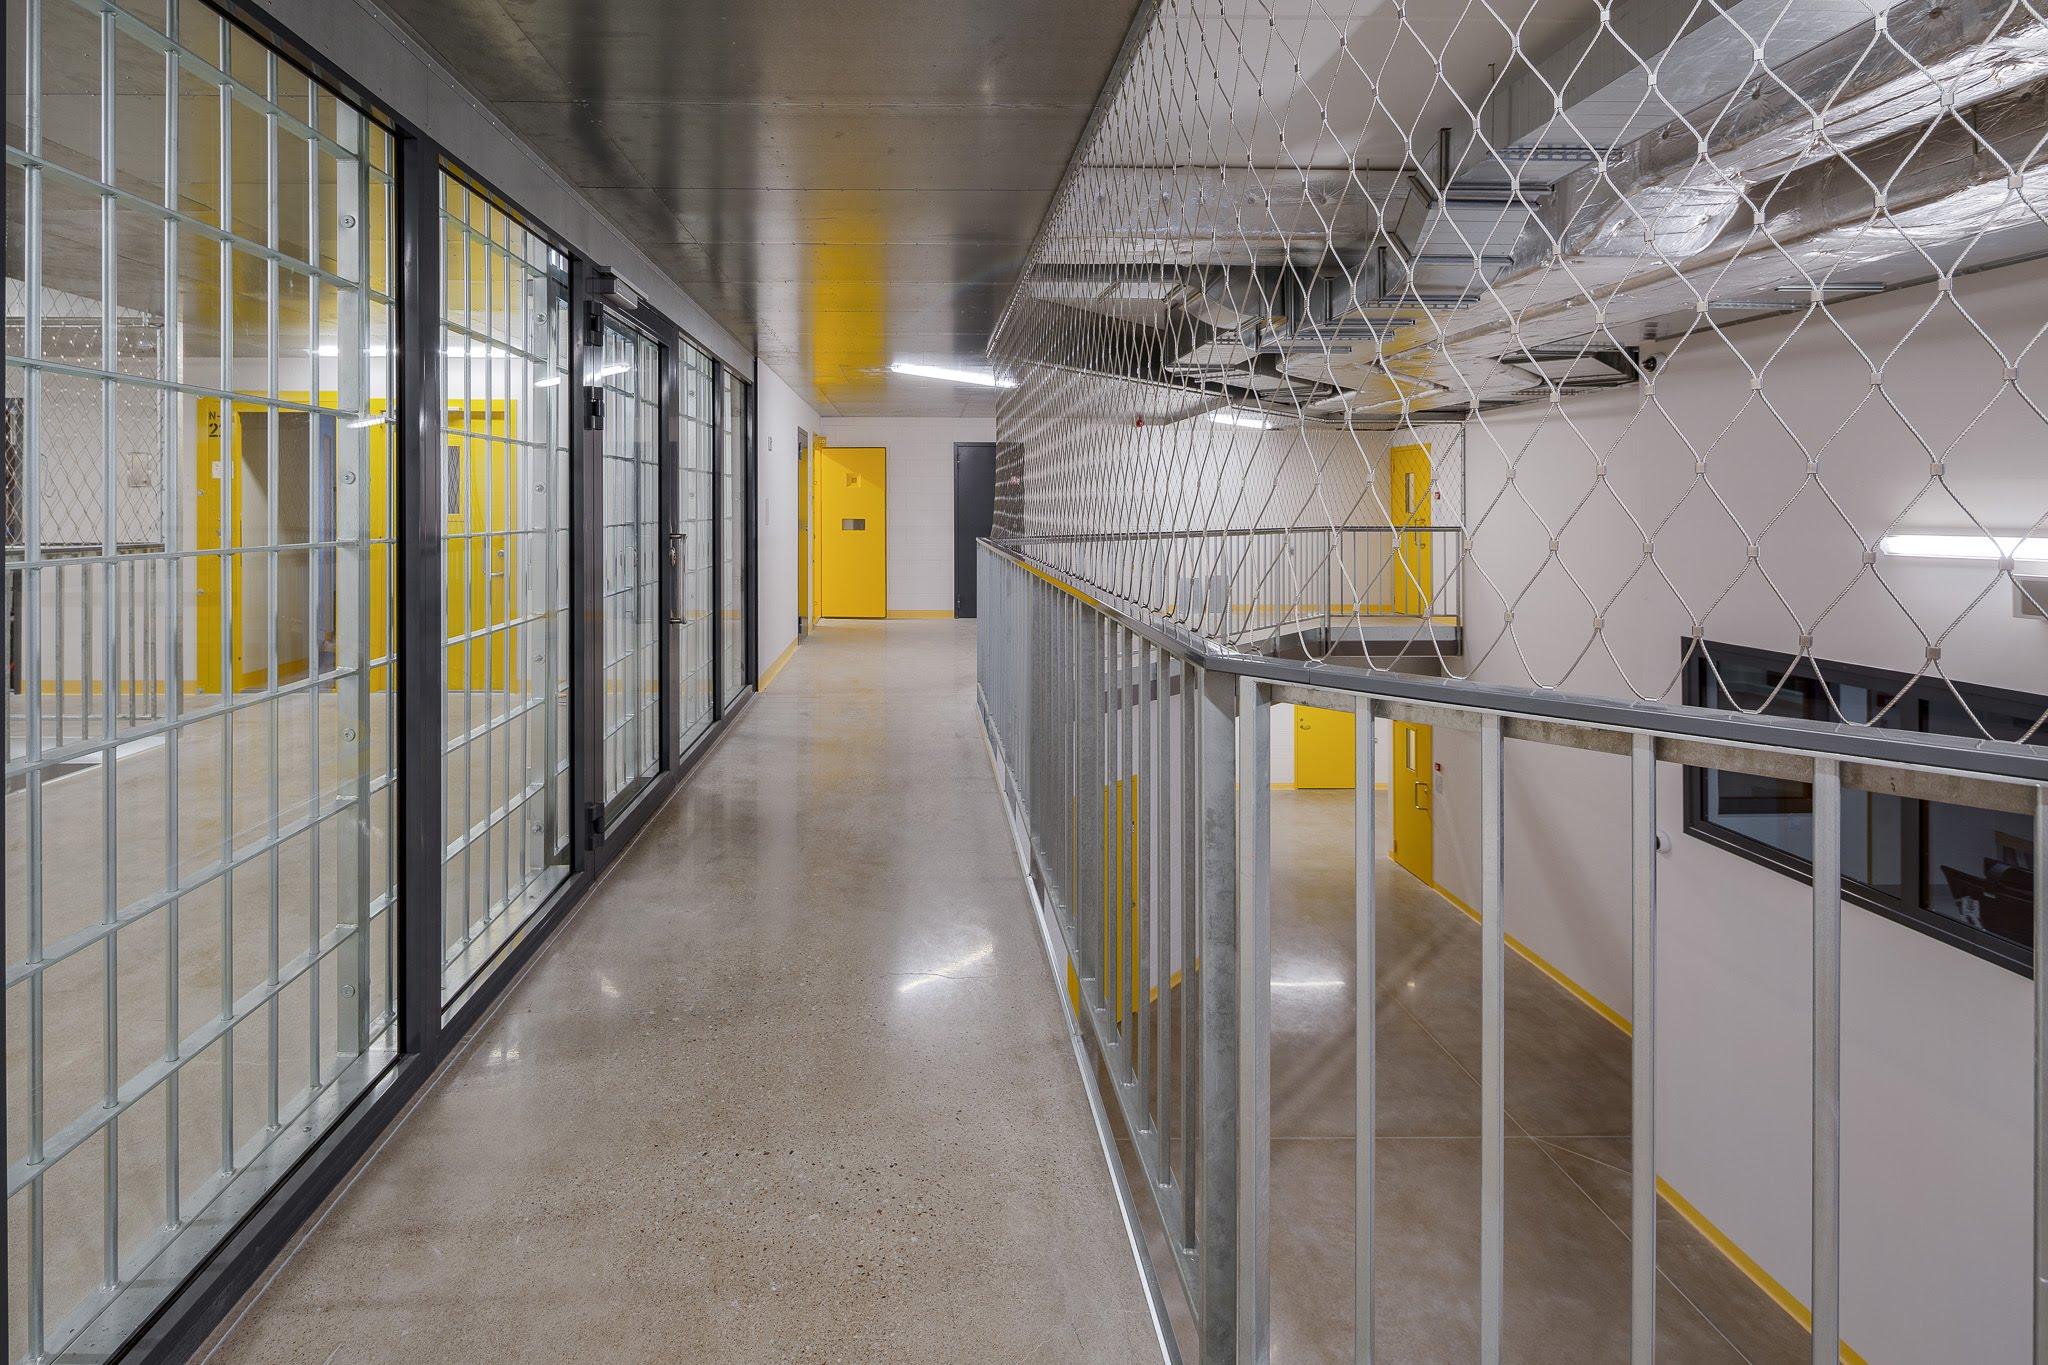 Tallinna vangla